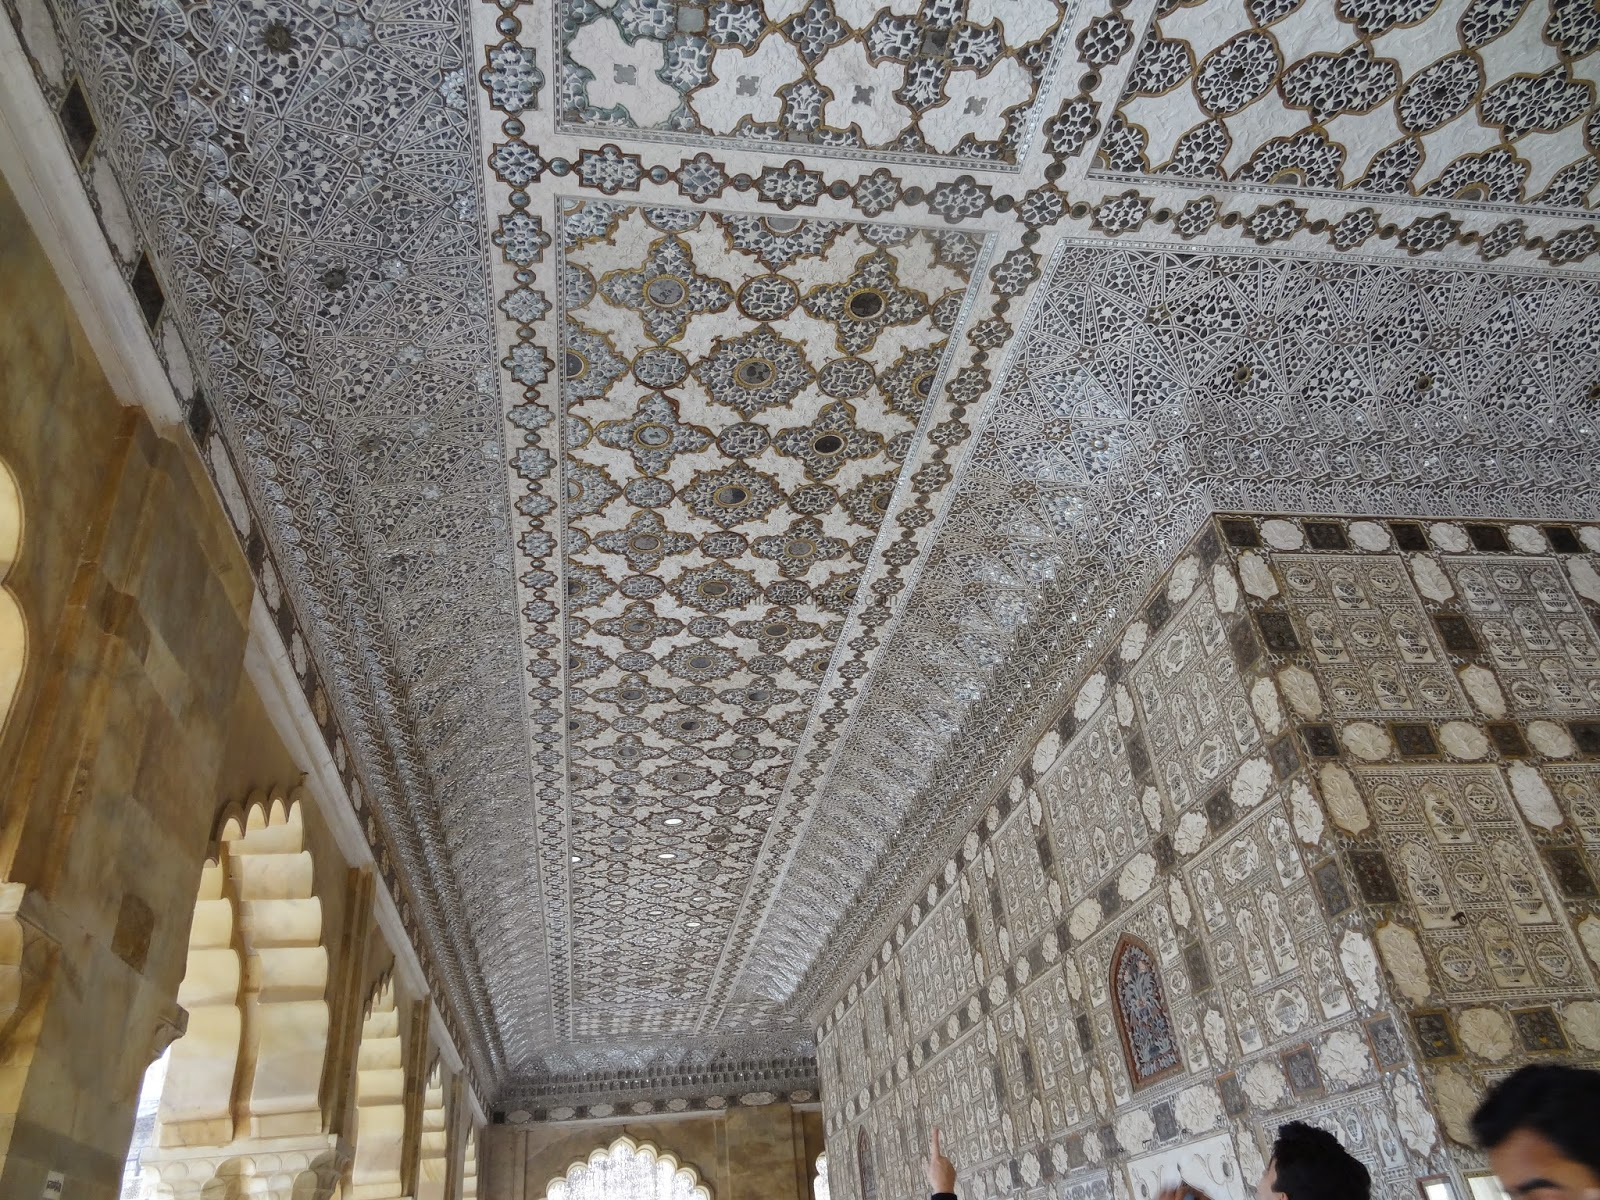 The Mirror Palace - Sheesh Mahal Amber fort - Rajasthan India - Pick, Pack, Go